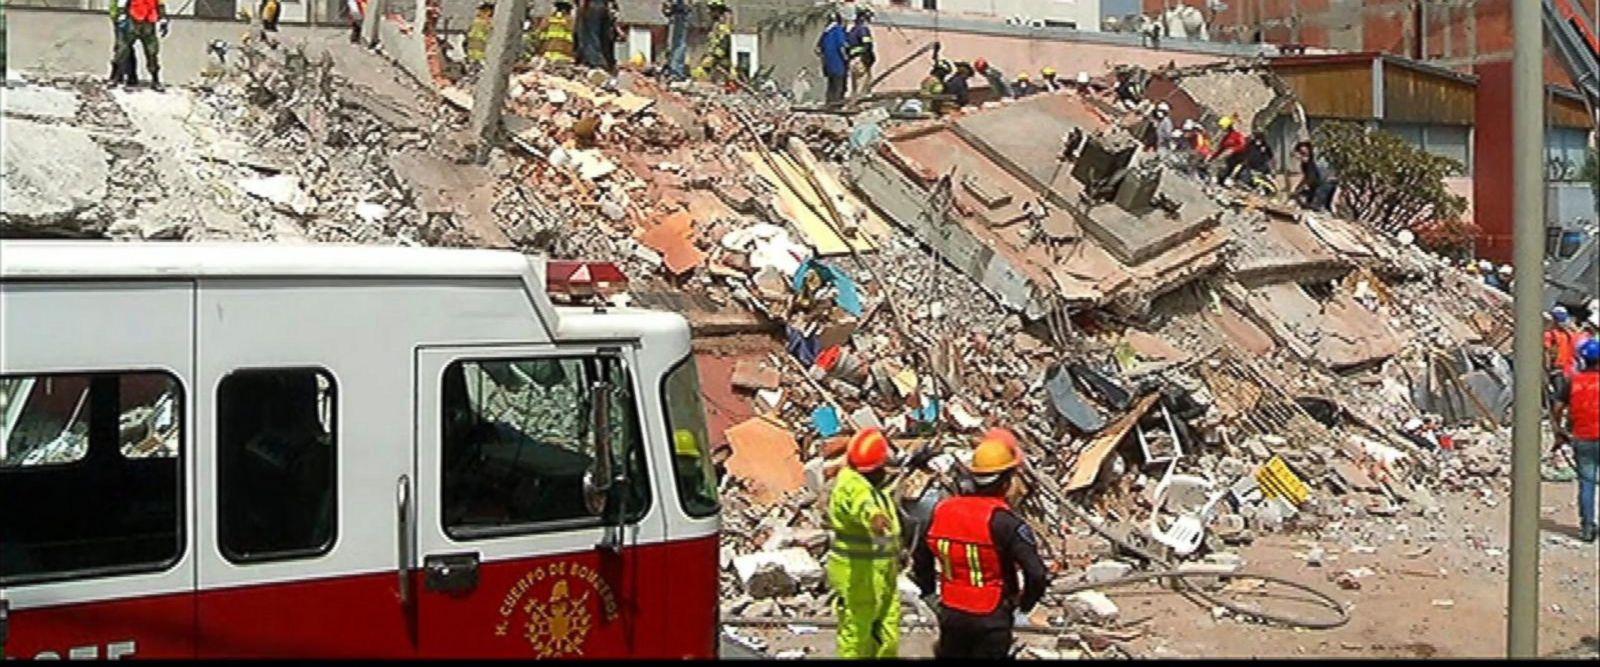 A 7.1 magnitude earthquake struck Tuesday, killing hundreds.